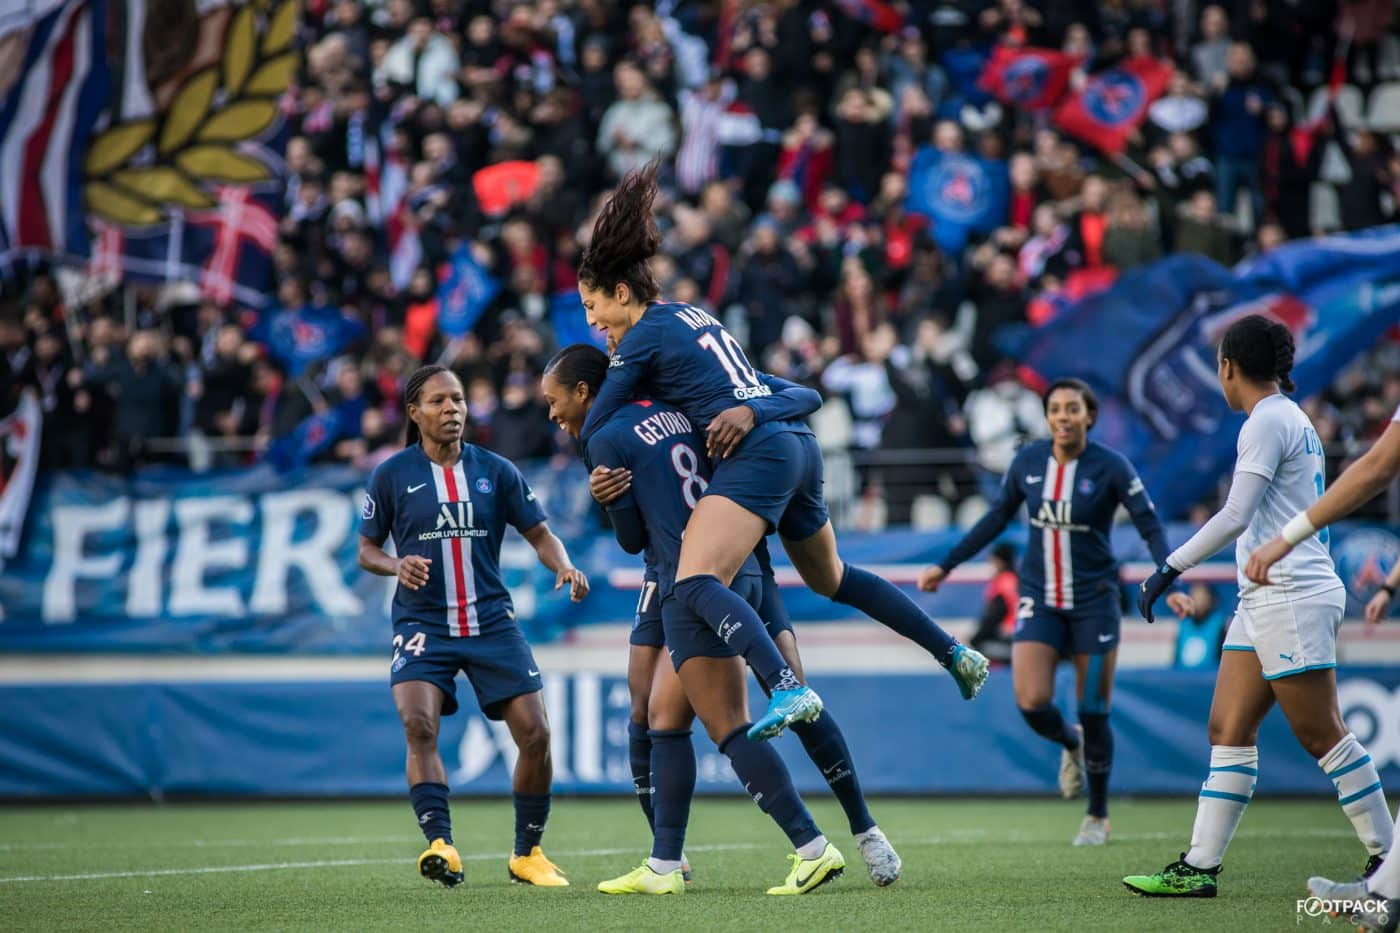 au-stade-paris-saint-germain-psg-olympique-de-marseille-d1-feminine-arkema-footpack-13